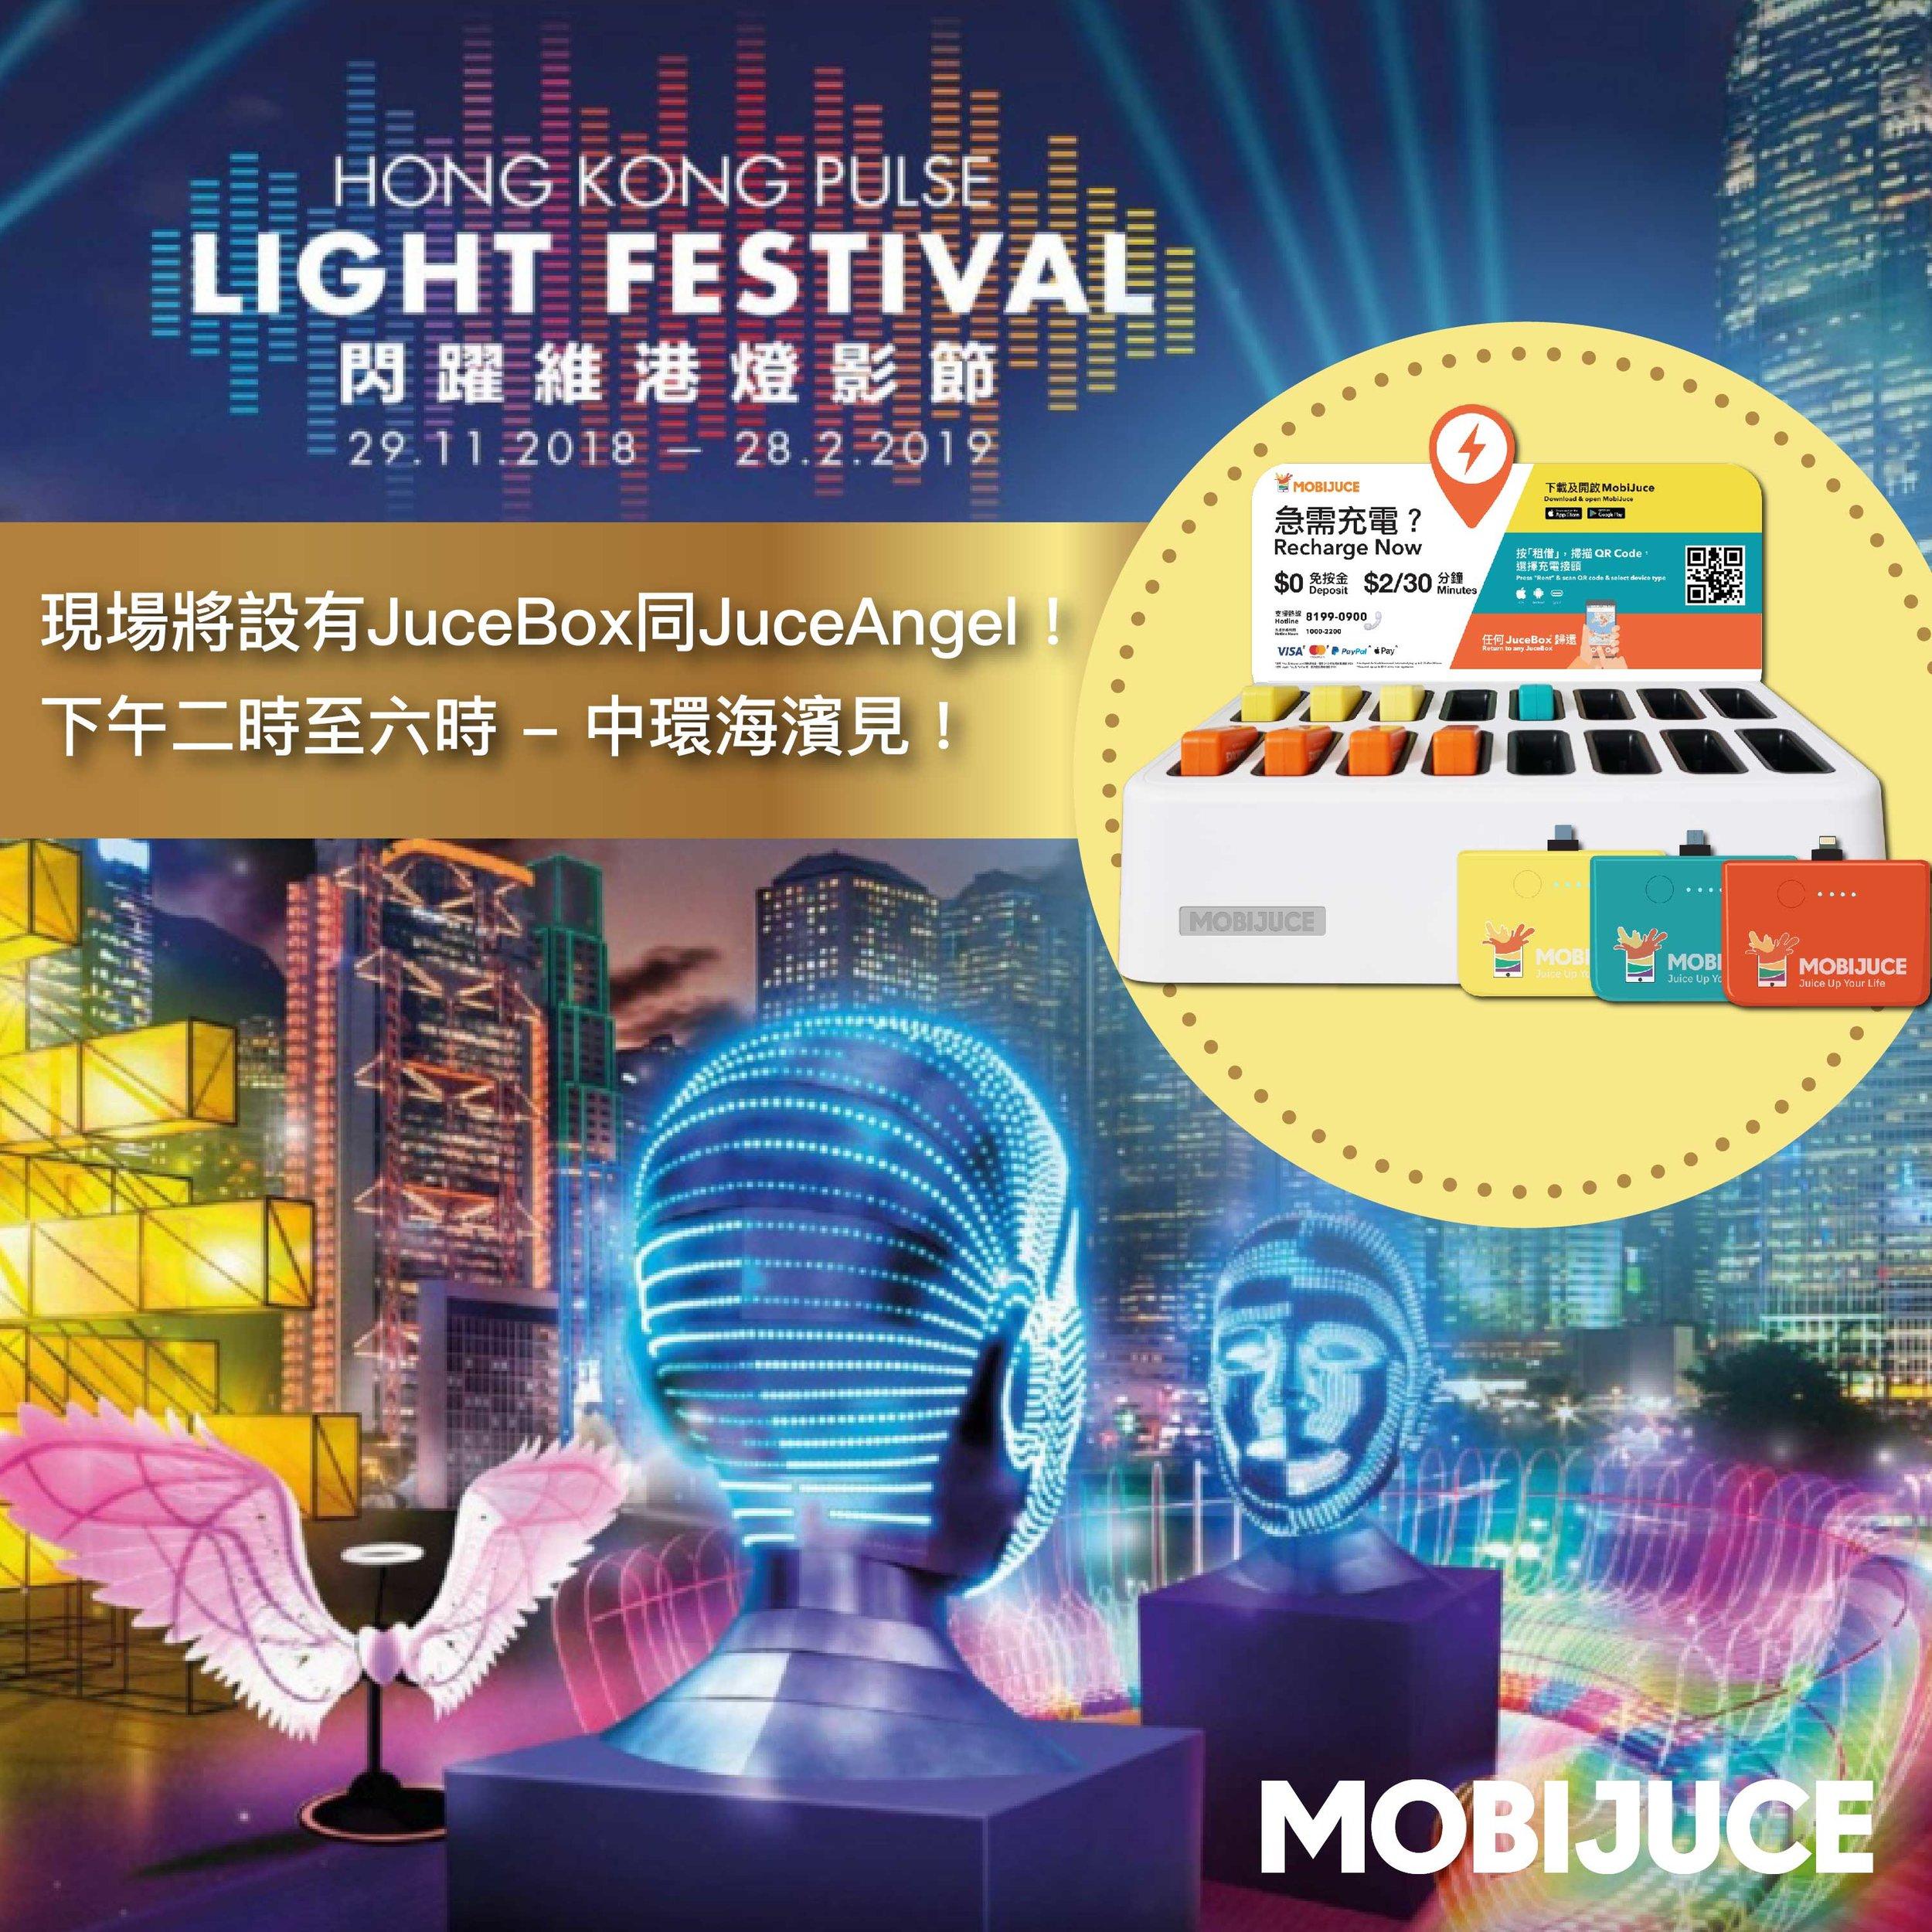 HKPulseLightFest.jpg